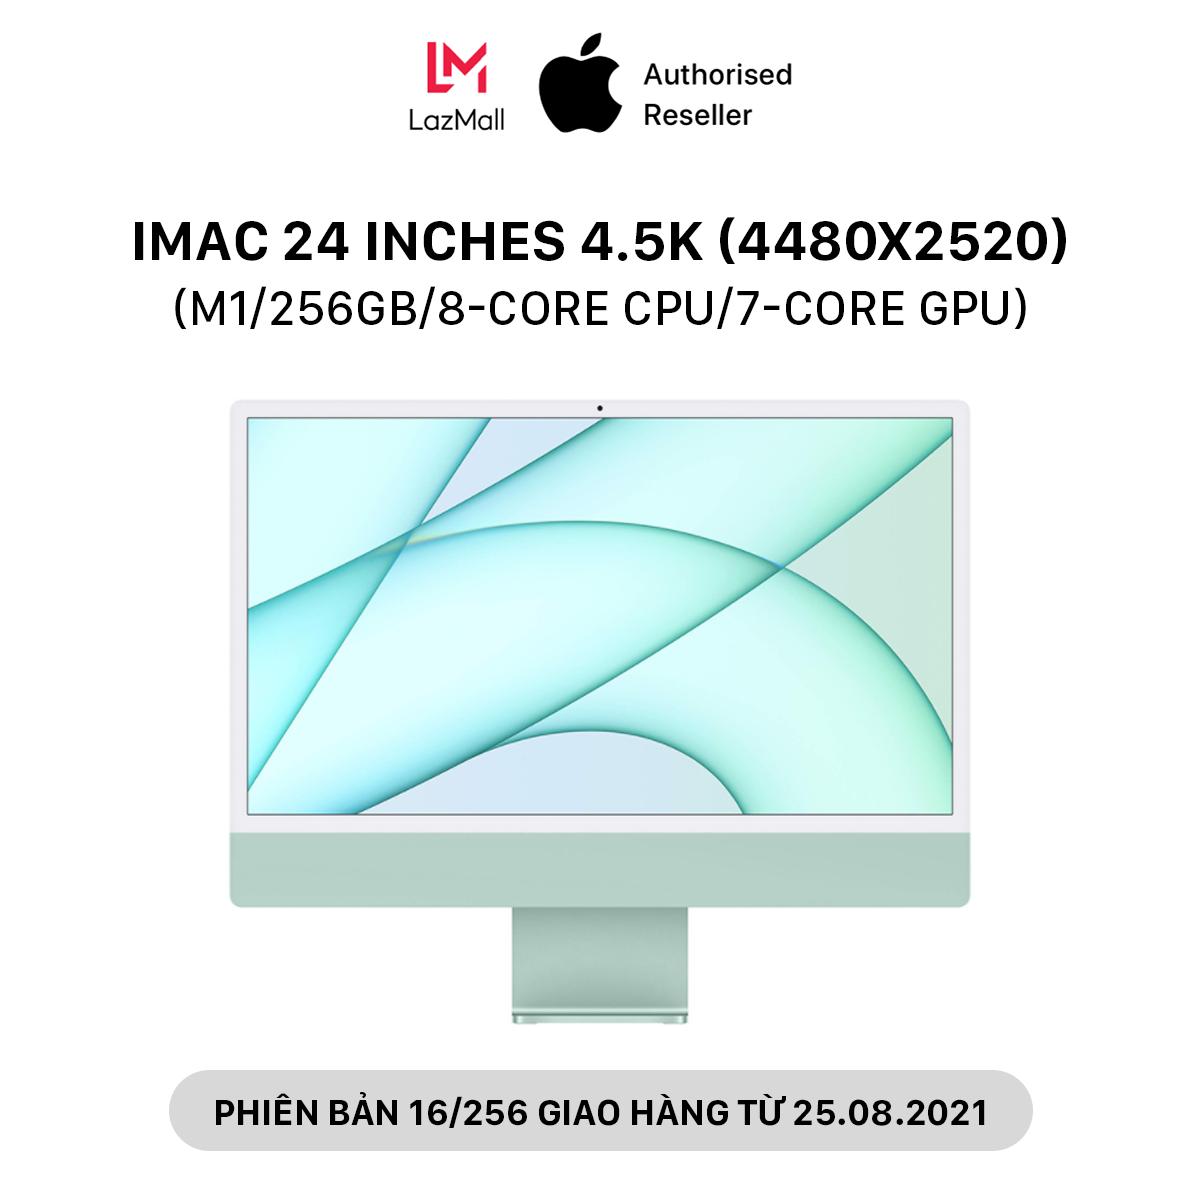 iMac 24 inches 4.5K (4480×2520) M1 Chipset (8GB-16GB/256GB/8-Core CPU/7-Core GPU) l HÀNG CHÍNH HÃNG